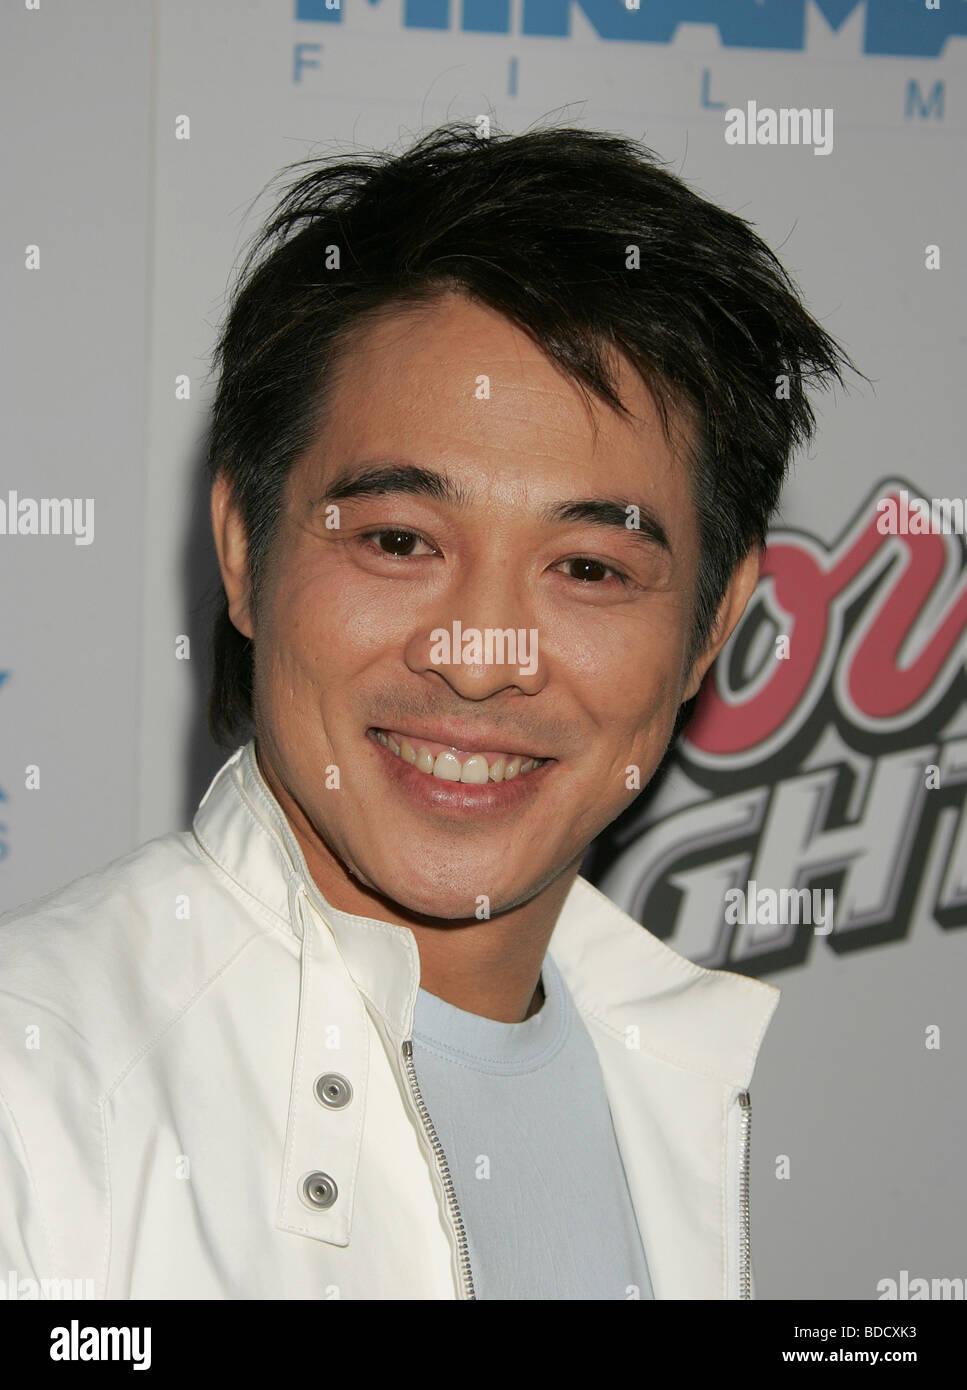 JET LI - Chinese martial arts film actor - Stock Image